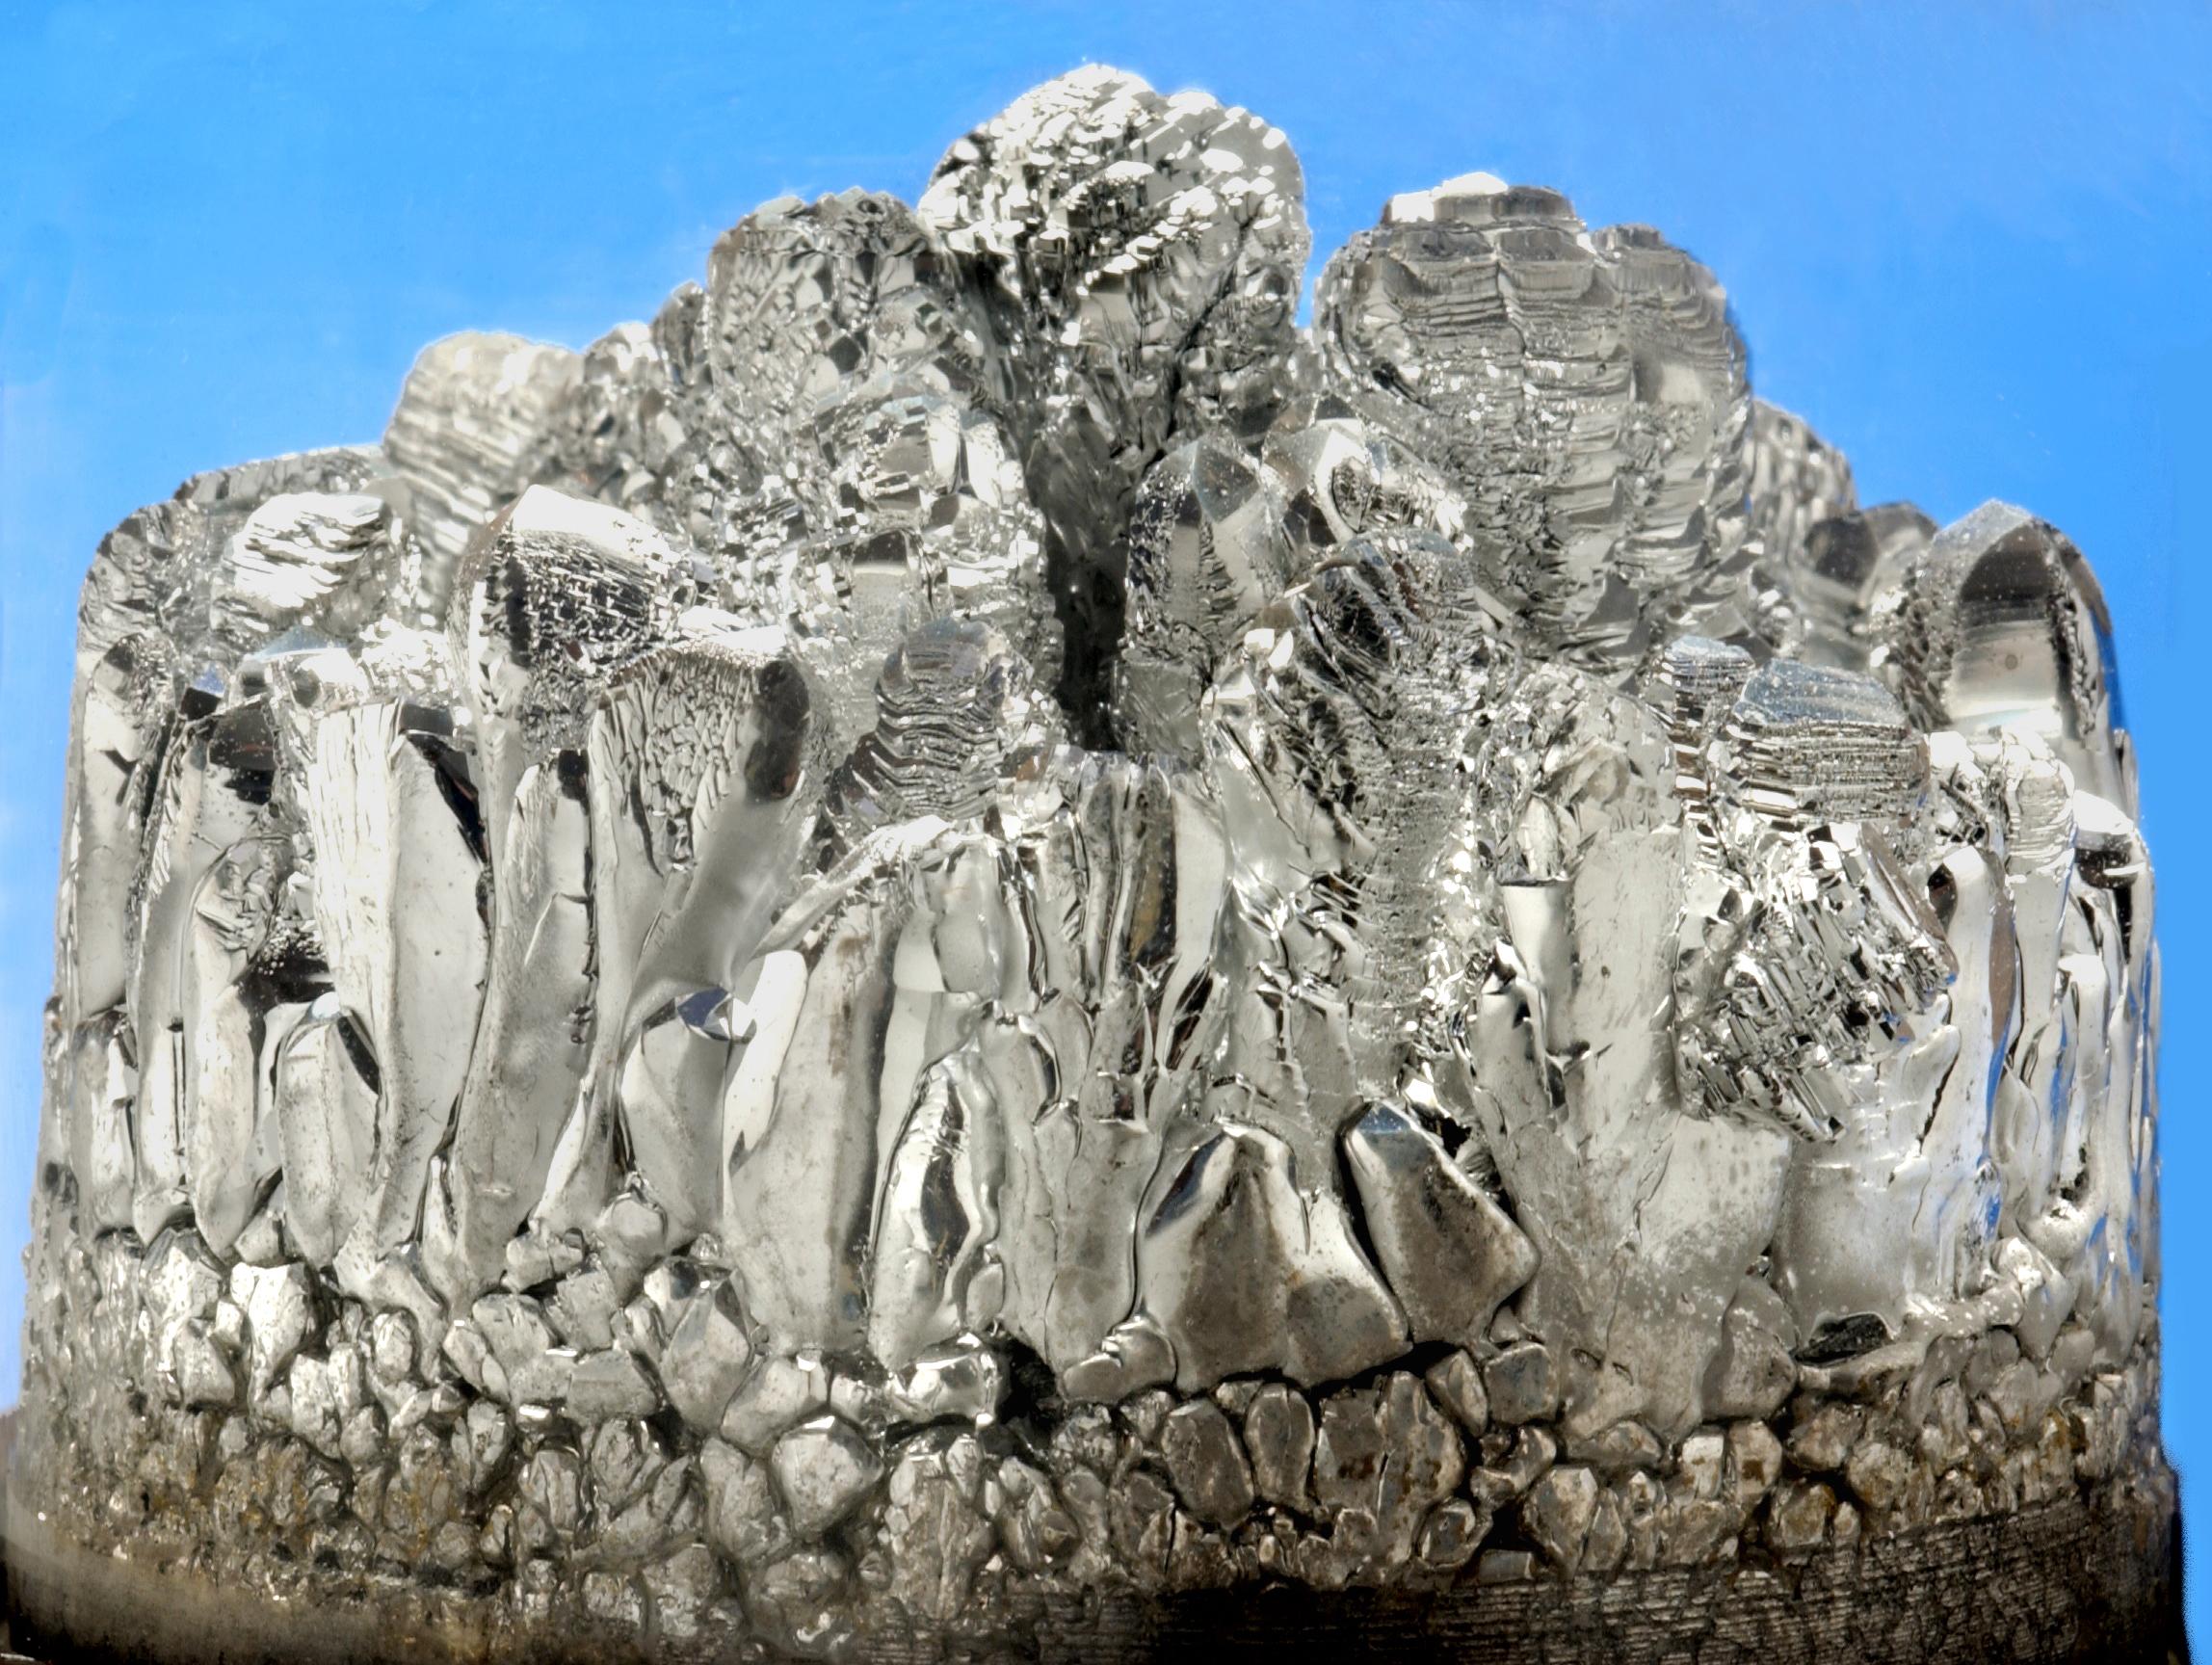 Where Can Livermorium Be Found In Nature